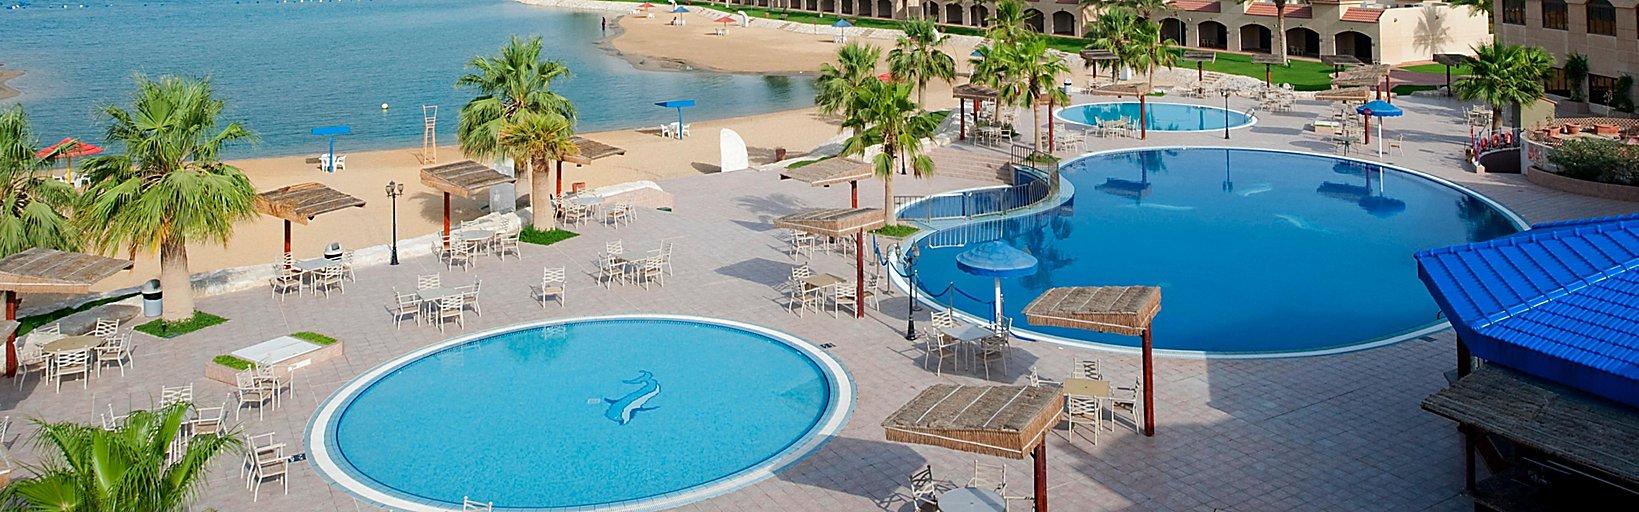 Holiday Inn Resort Half Moon Bay Hotel By Ihg